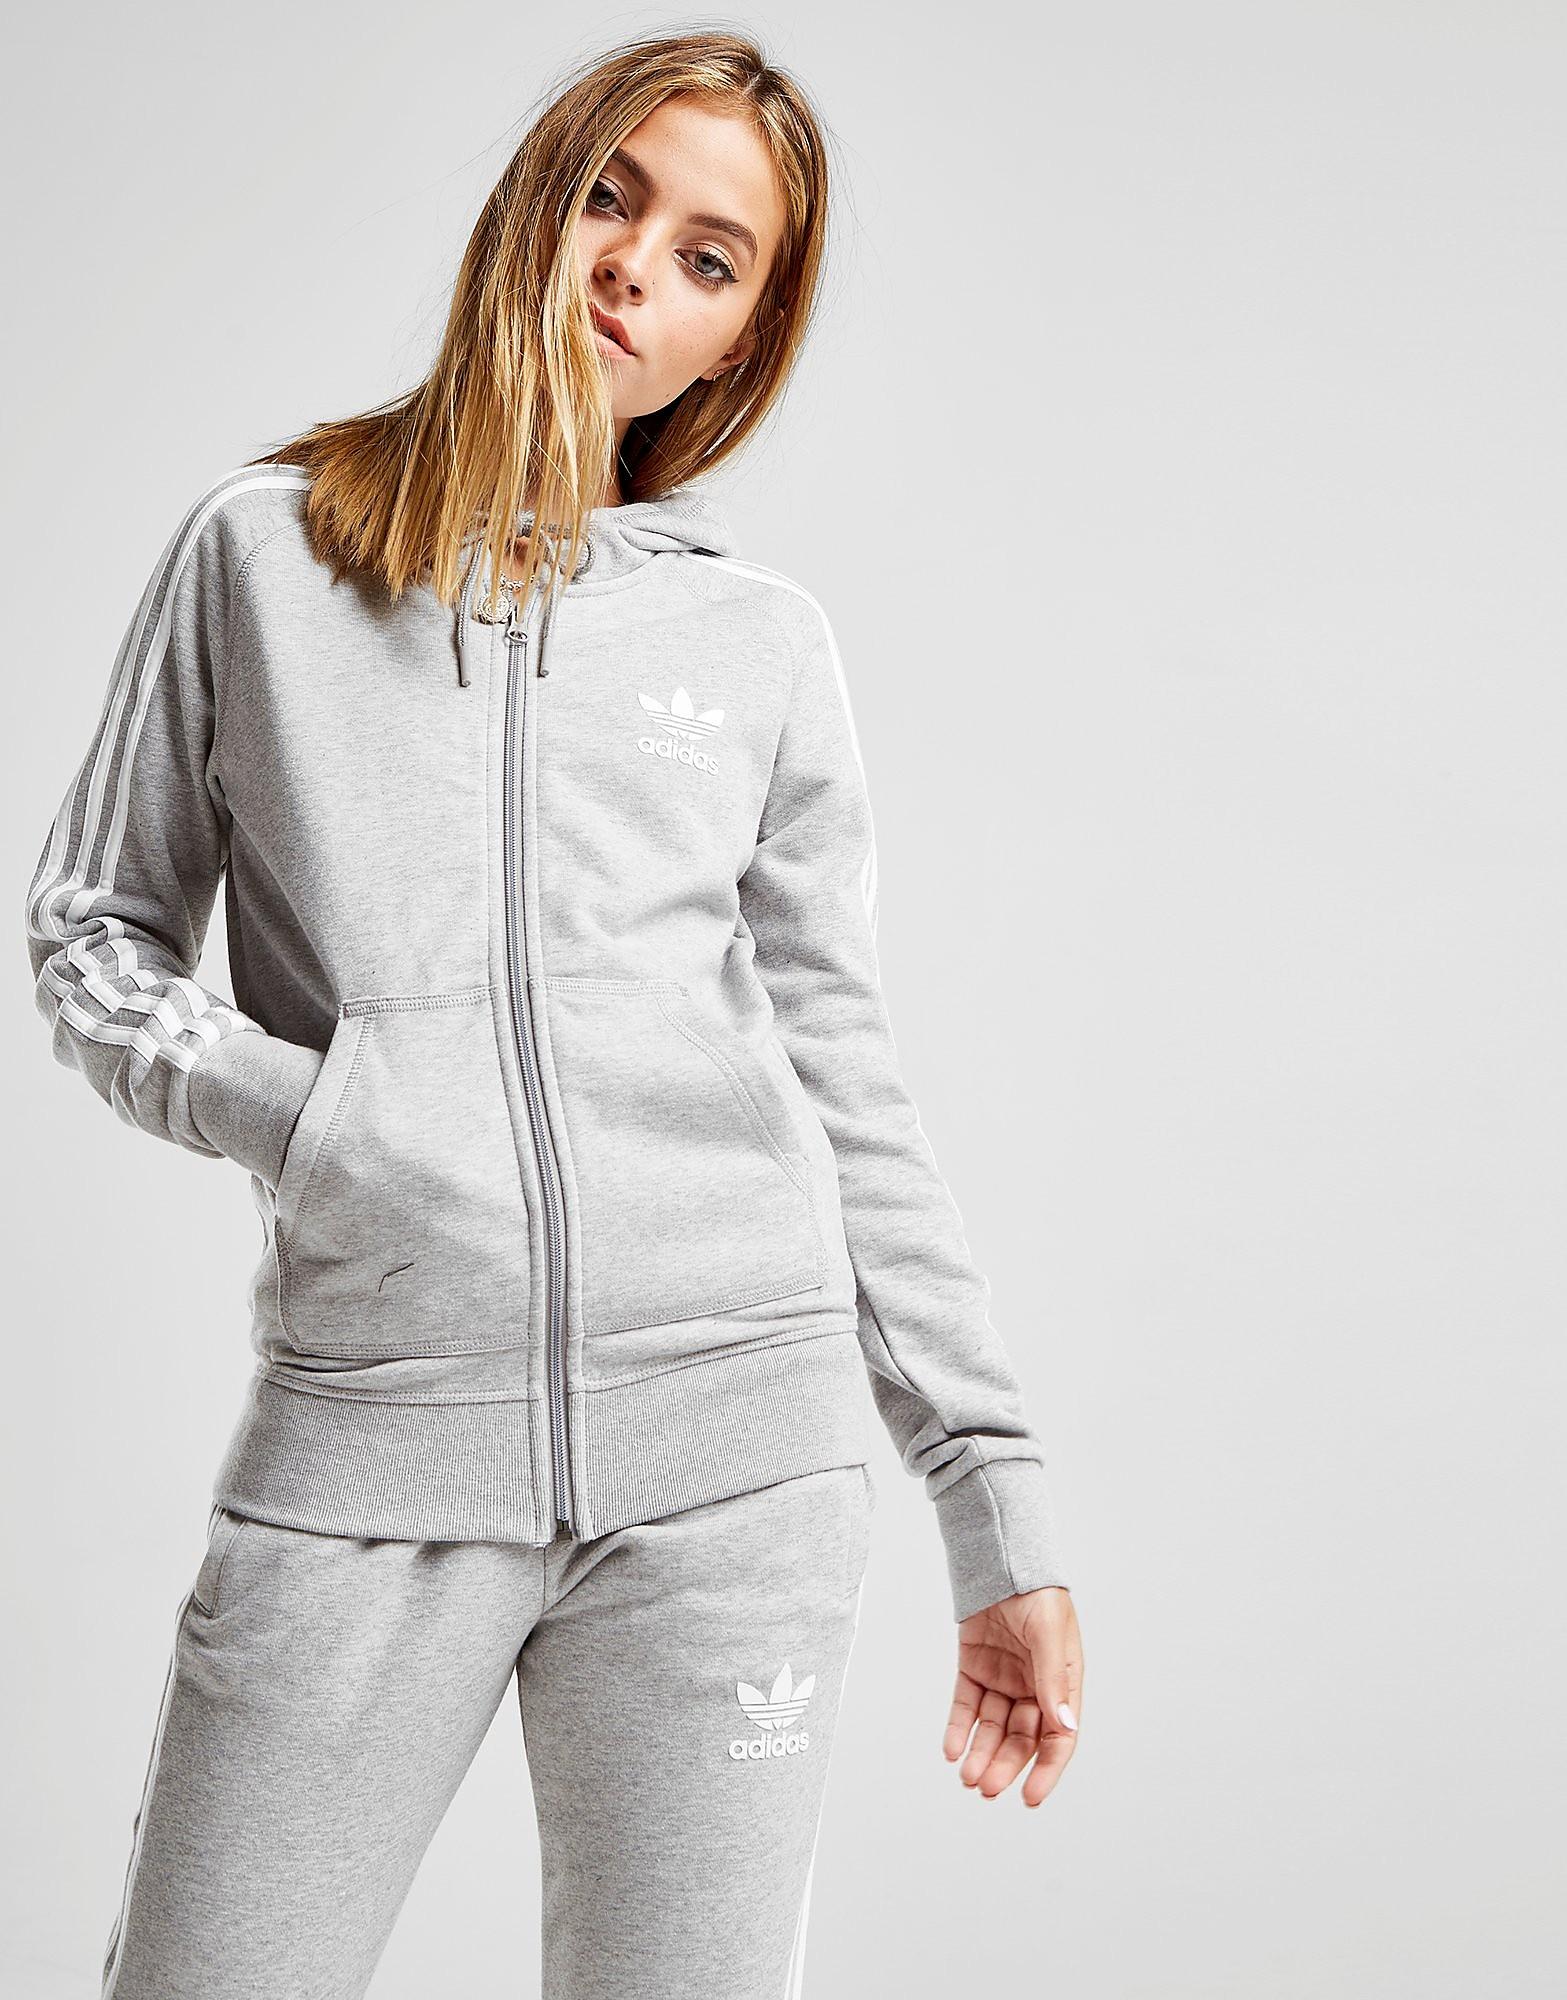 adidas Originals California Hoodie Damen - Only at JD - Grau - Womens, Grau von ADIDAS